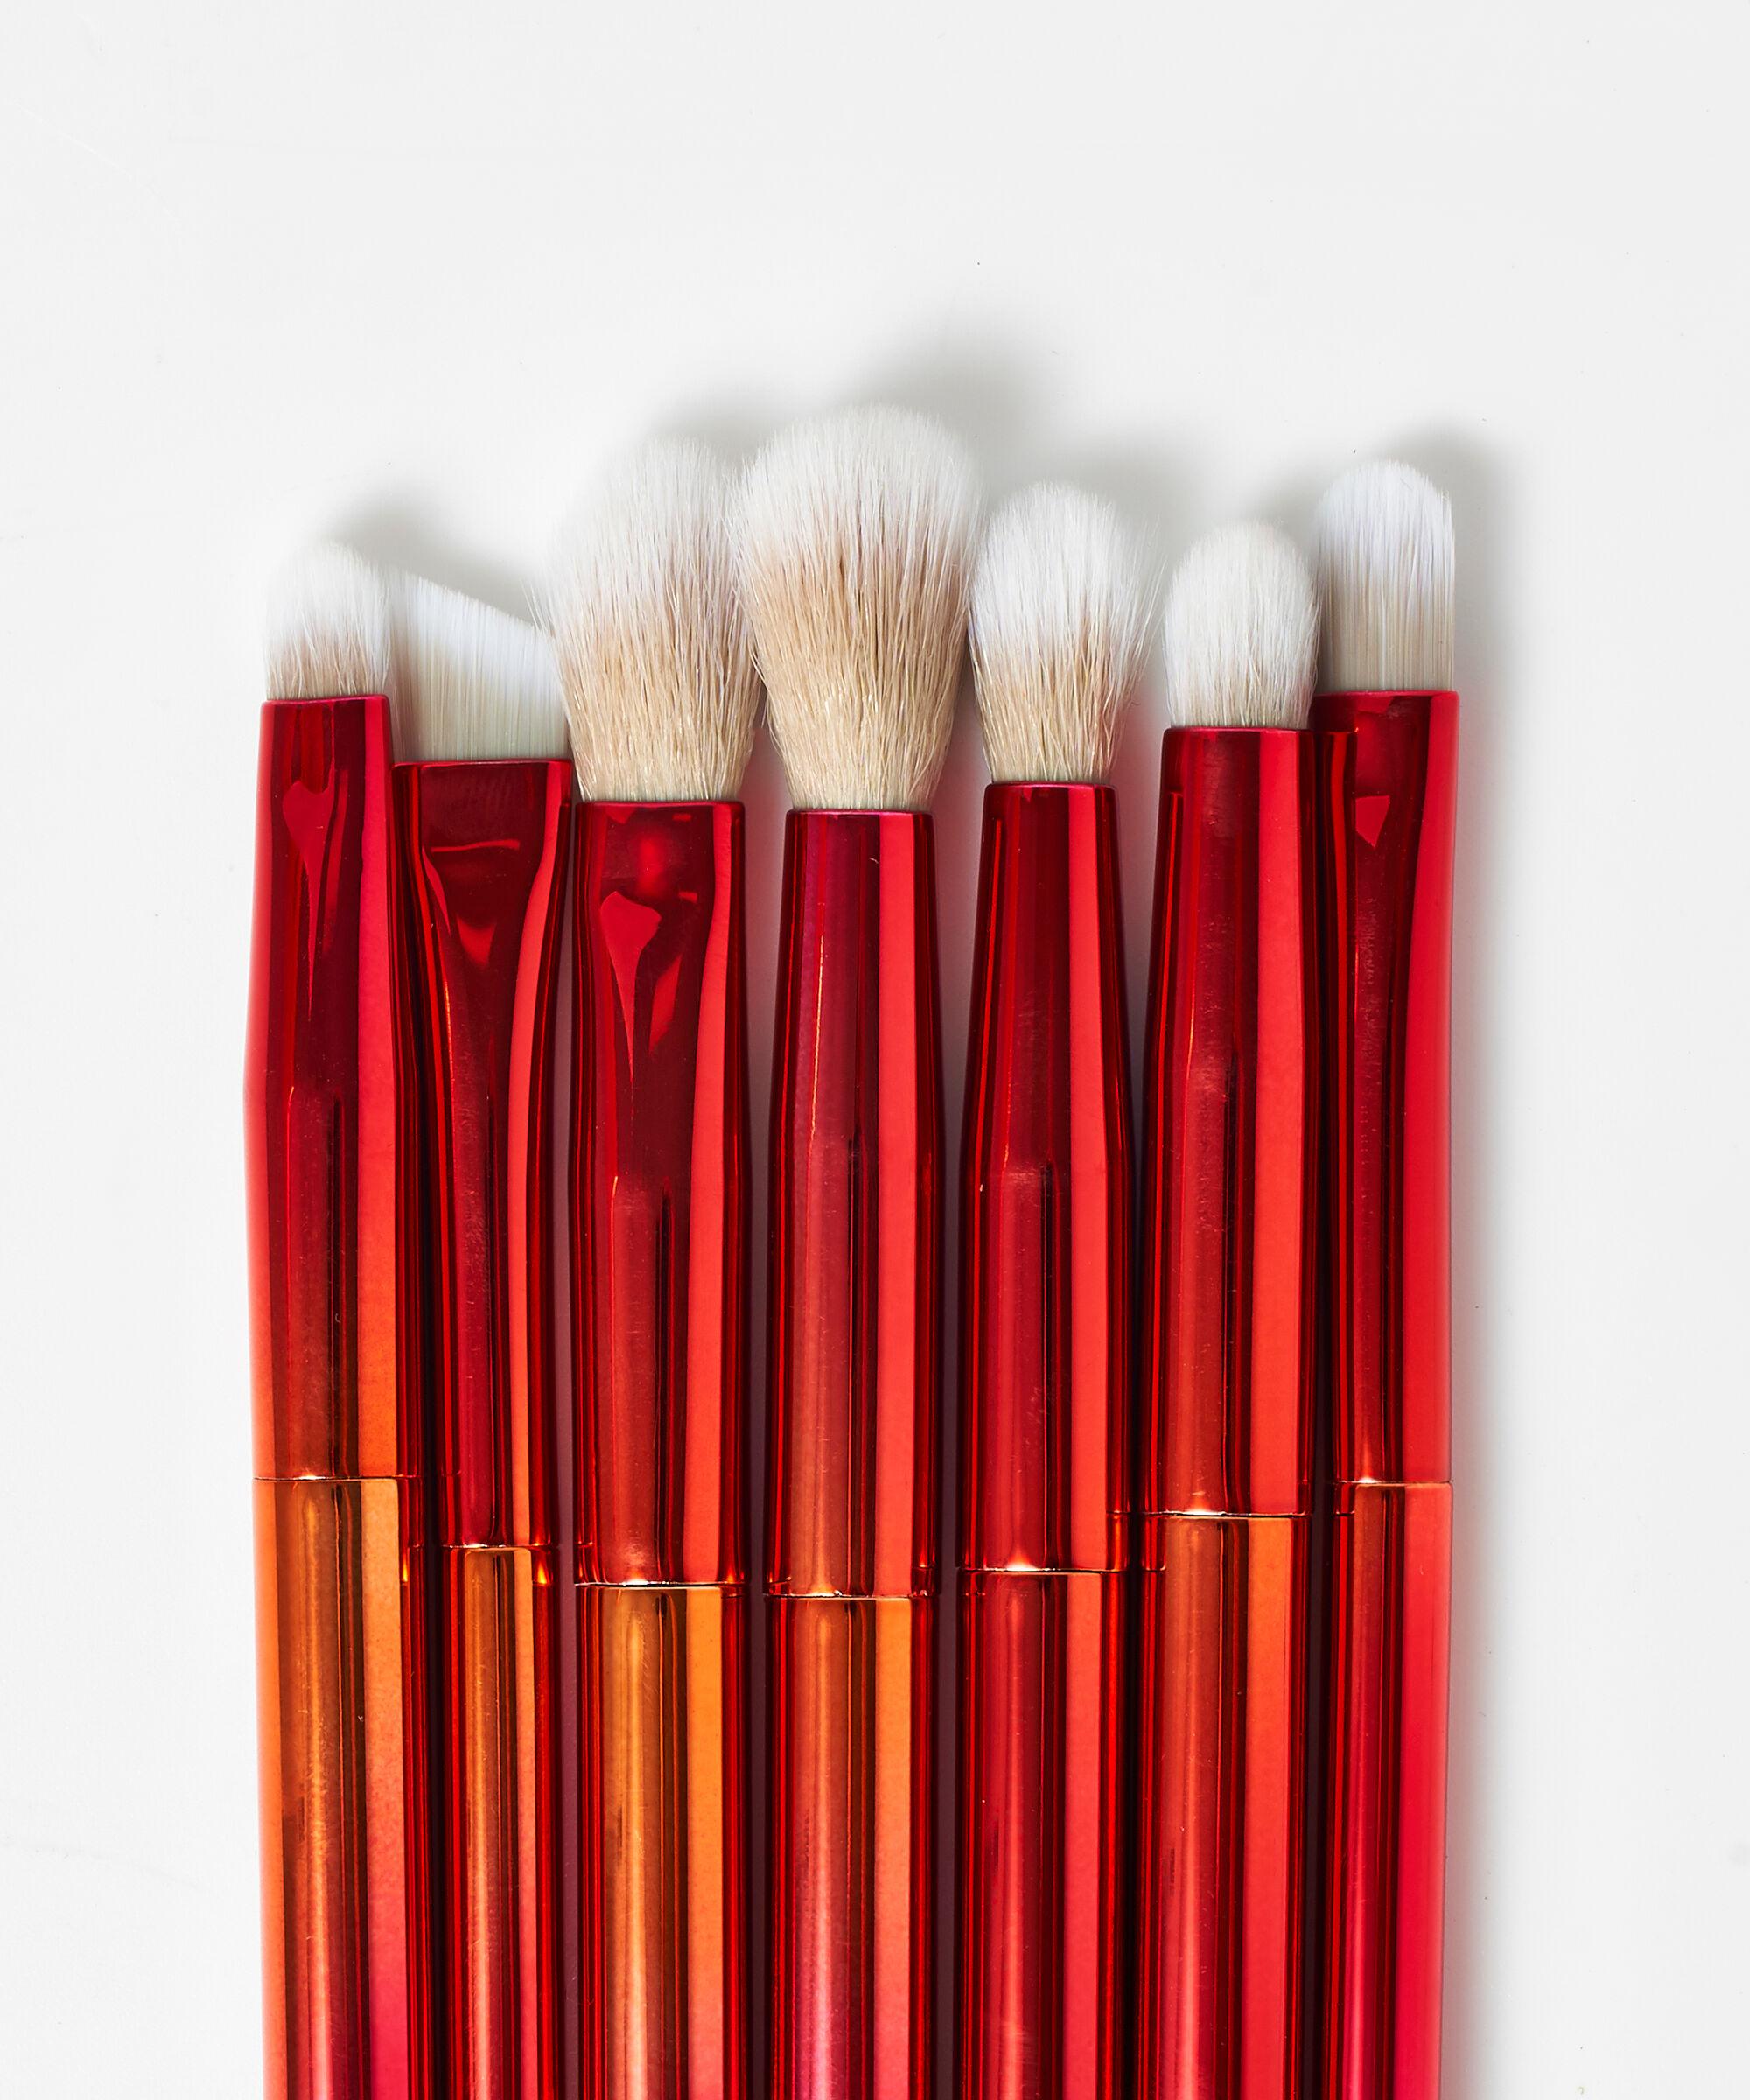 BH Cosmetics Chillin' in Chicago 7 Piece Brush Set